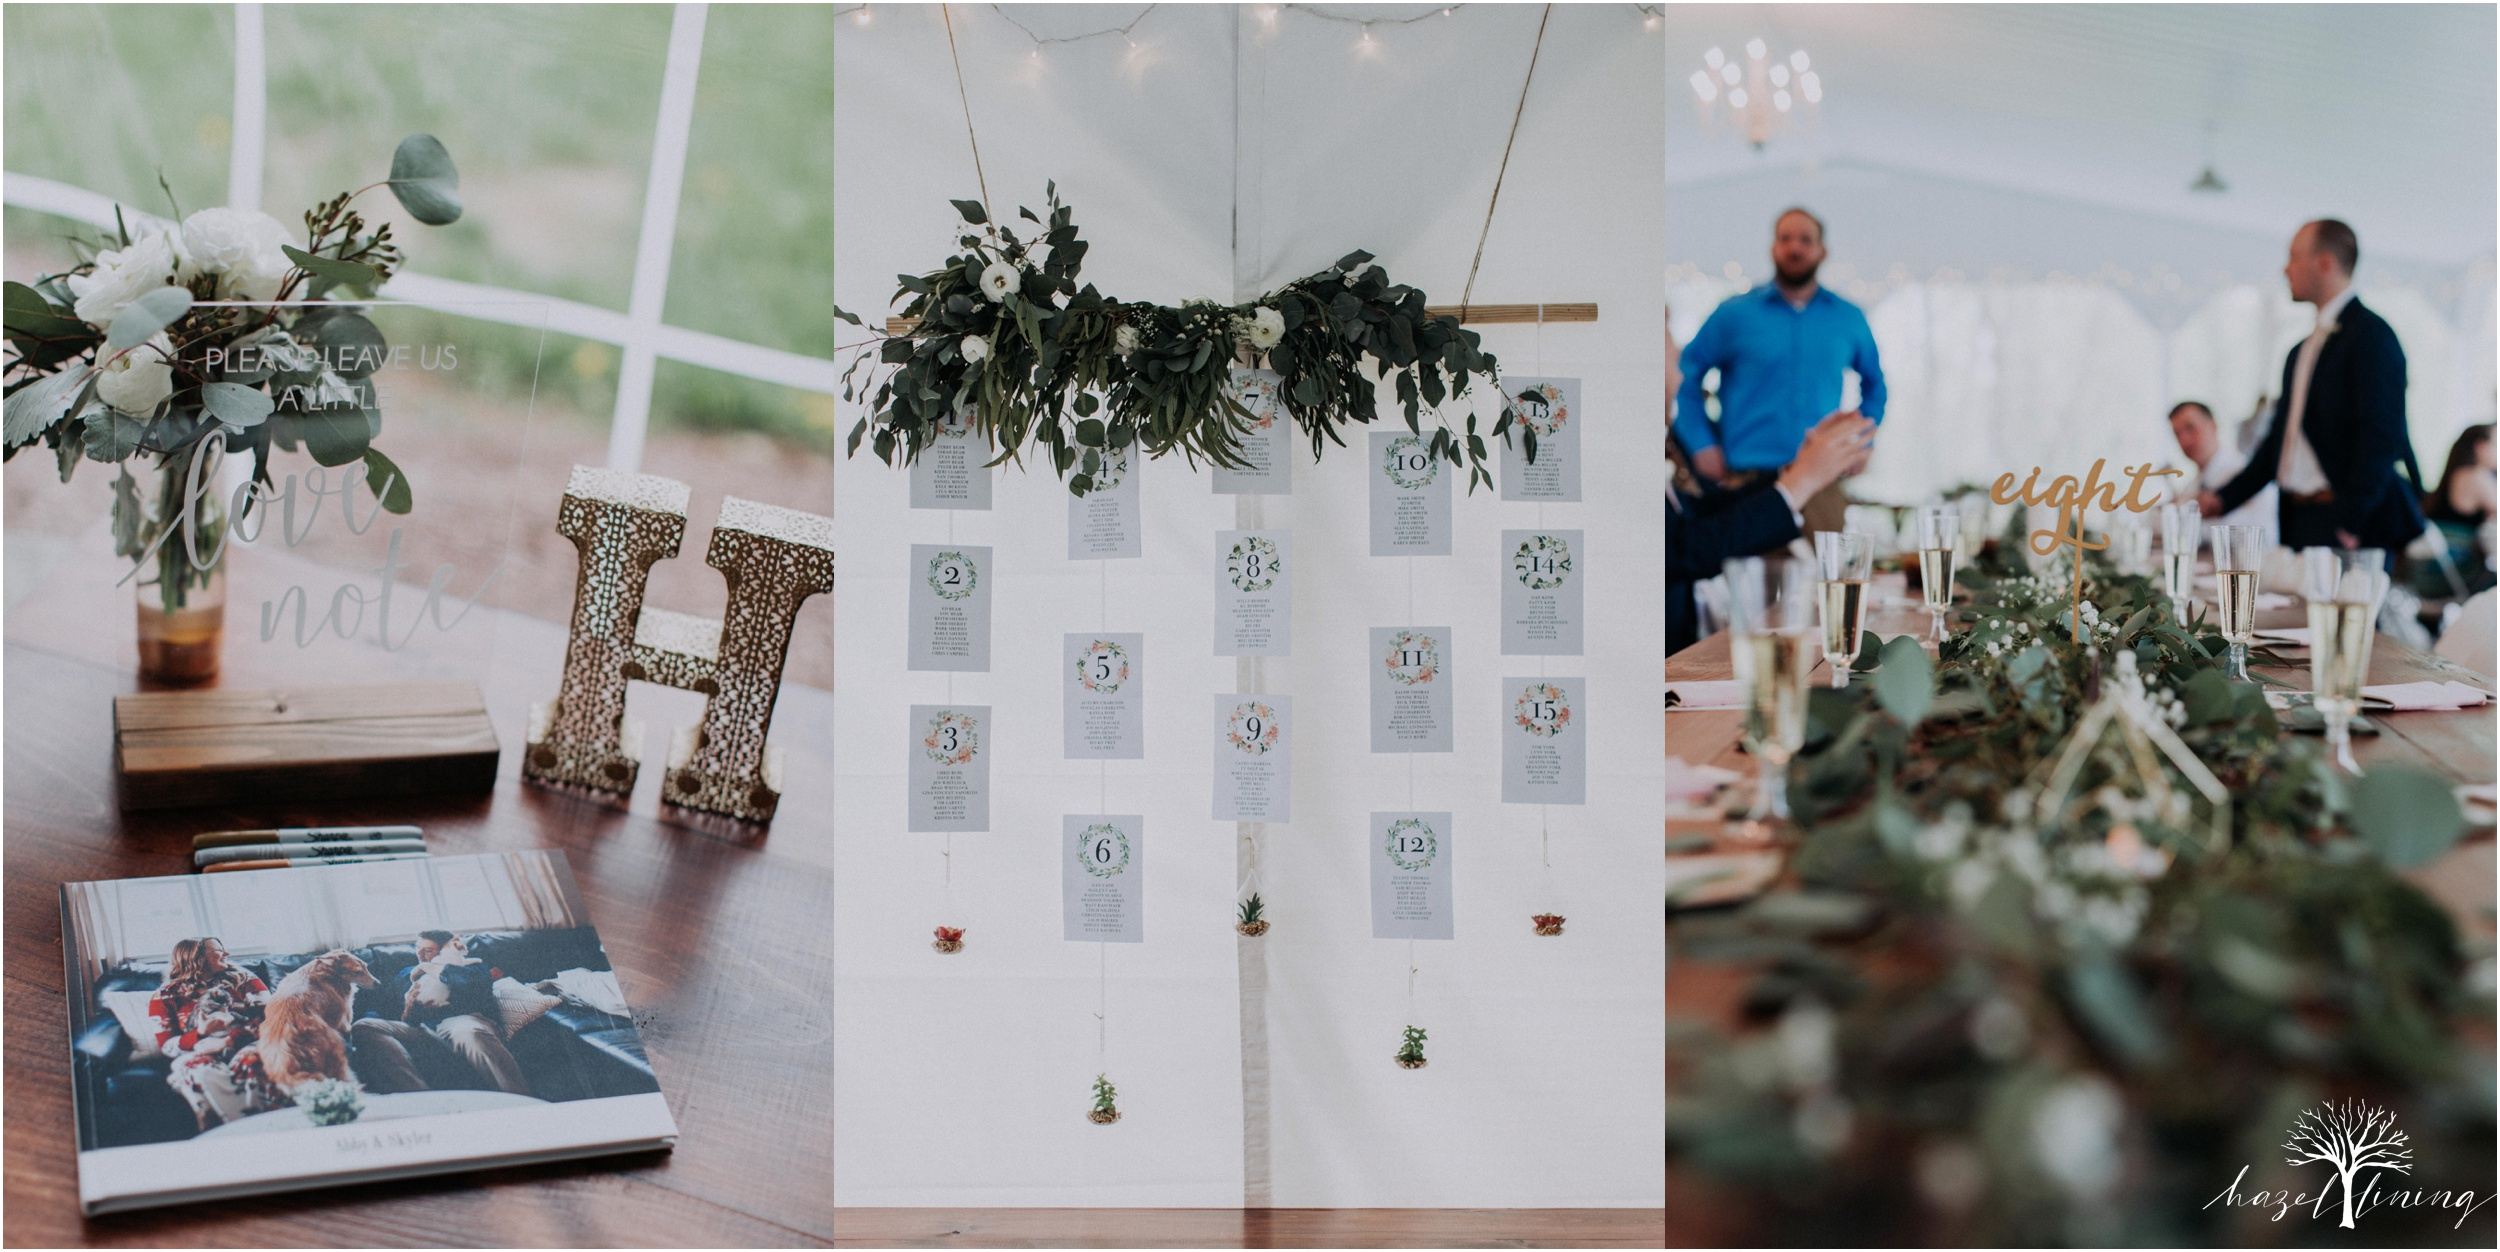 hazel-lining-travel-wedding-elopement-photography-abby-skyler-hunt-the-willis-house-york-pennsylvania-outdoor-estate-wedding_0097.jpg